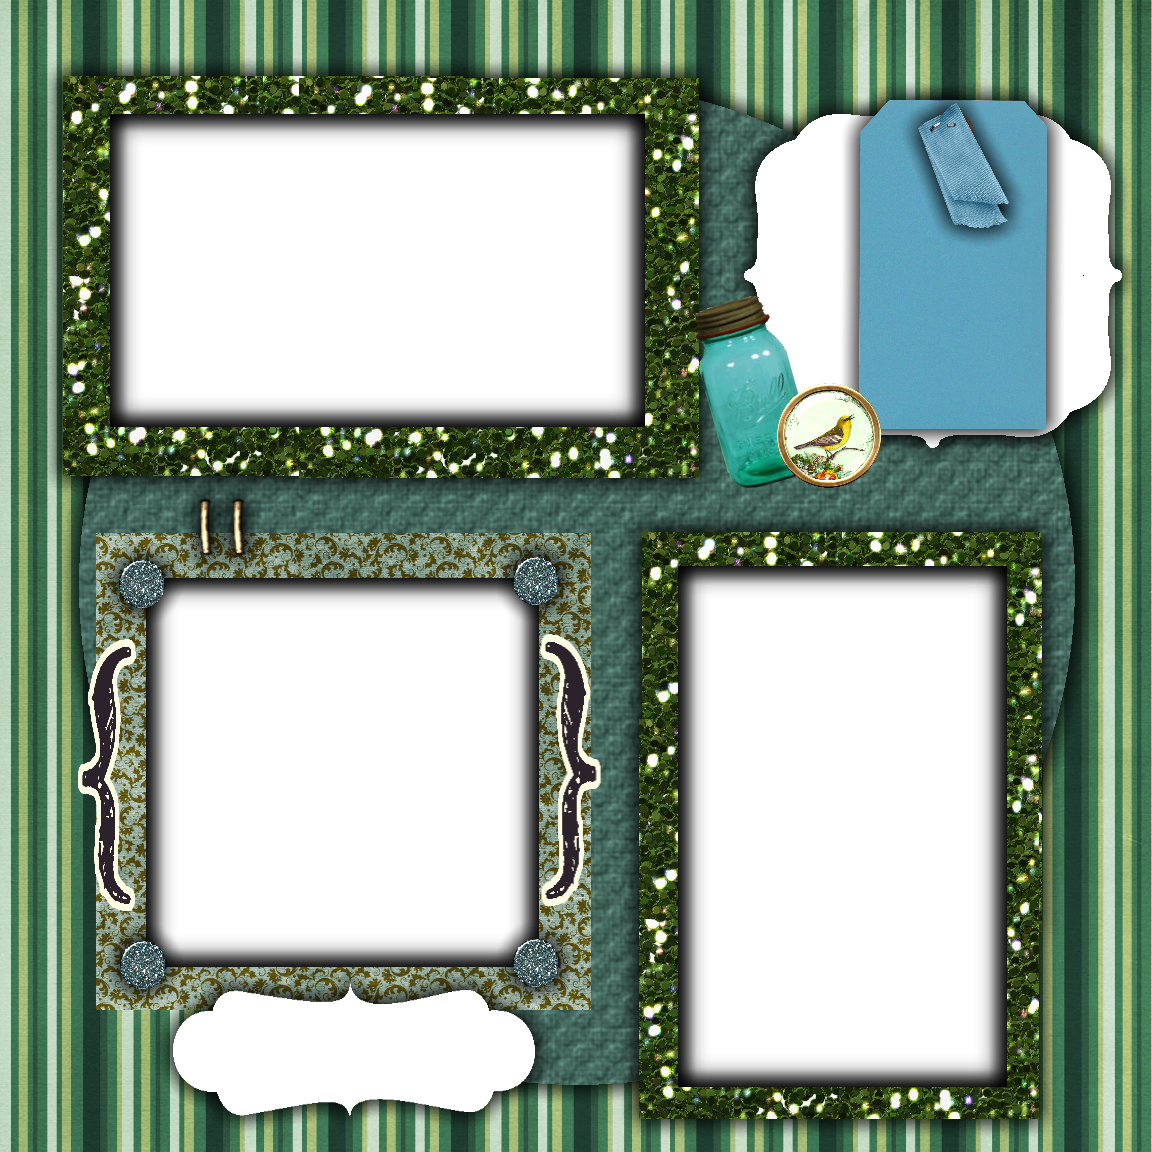 Transparent scrapbook page clipart - Scrapbook Design Printable For Boys - Scrapbook Layout Free Printable Scrapbook Templates